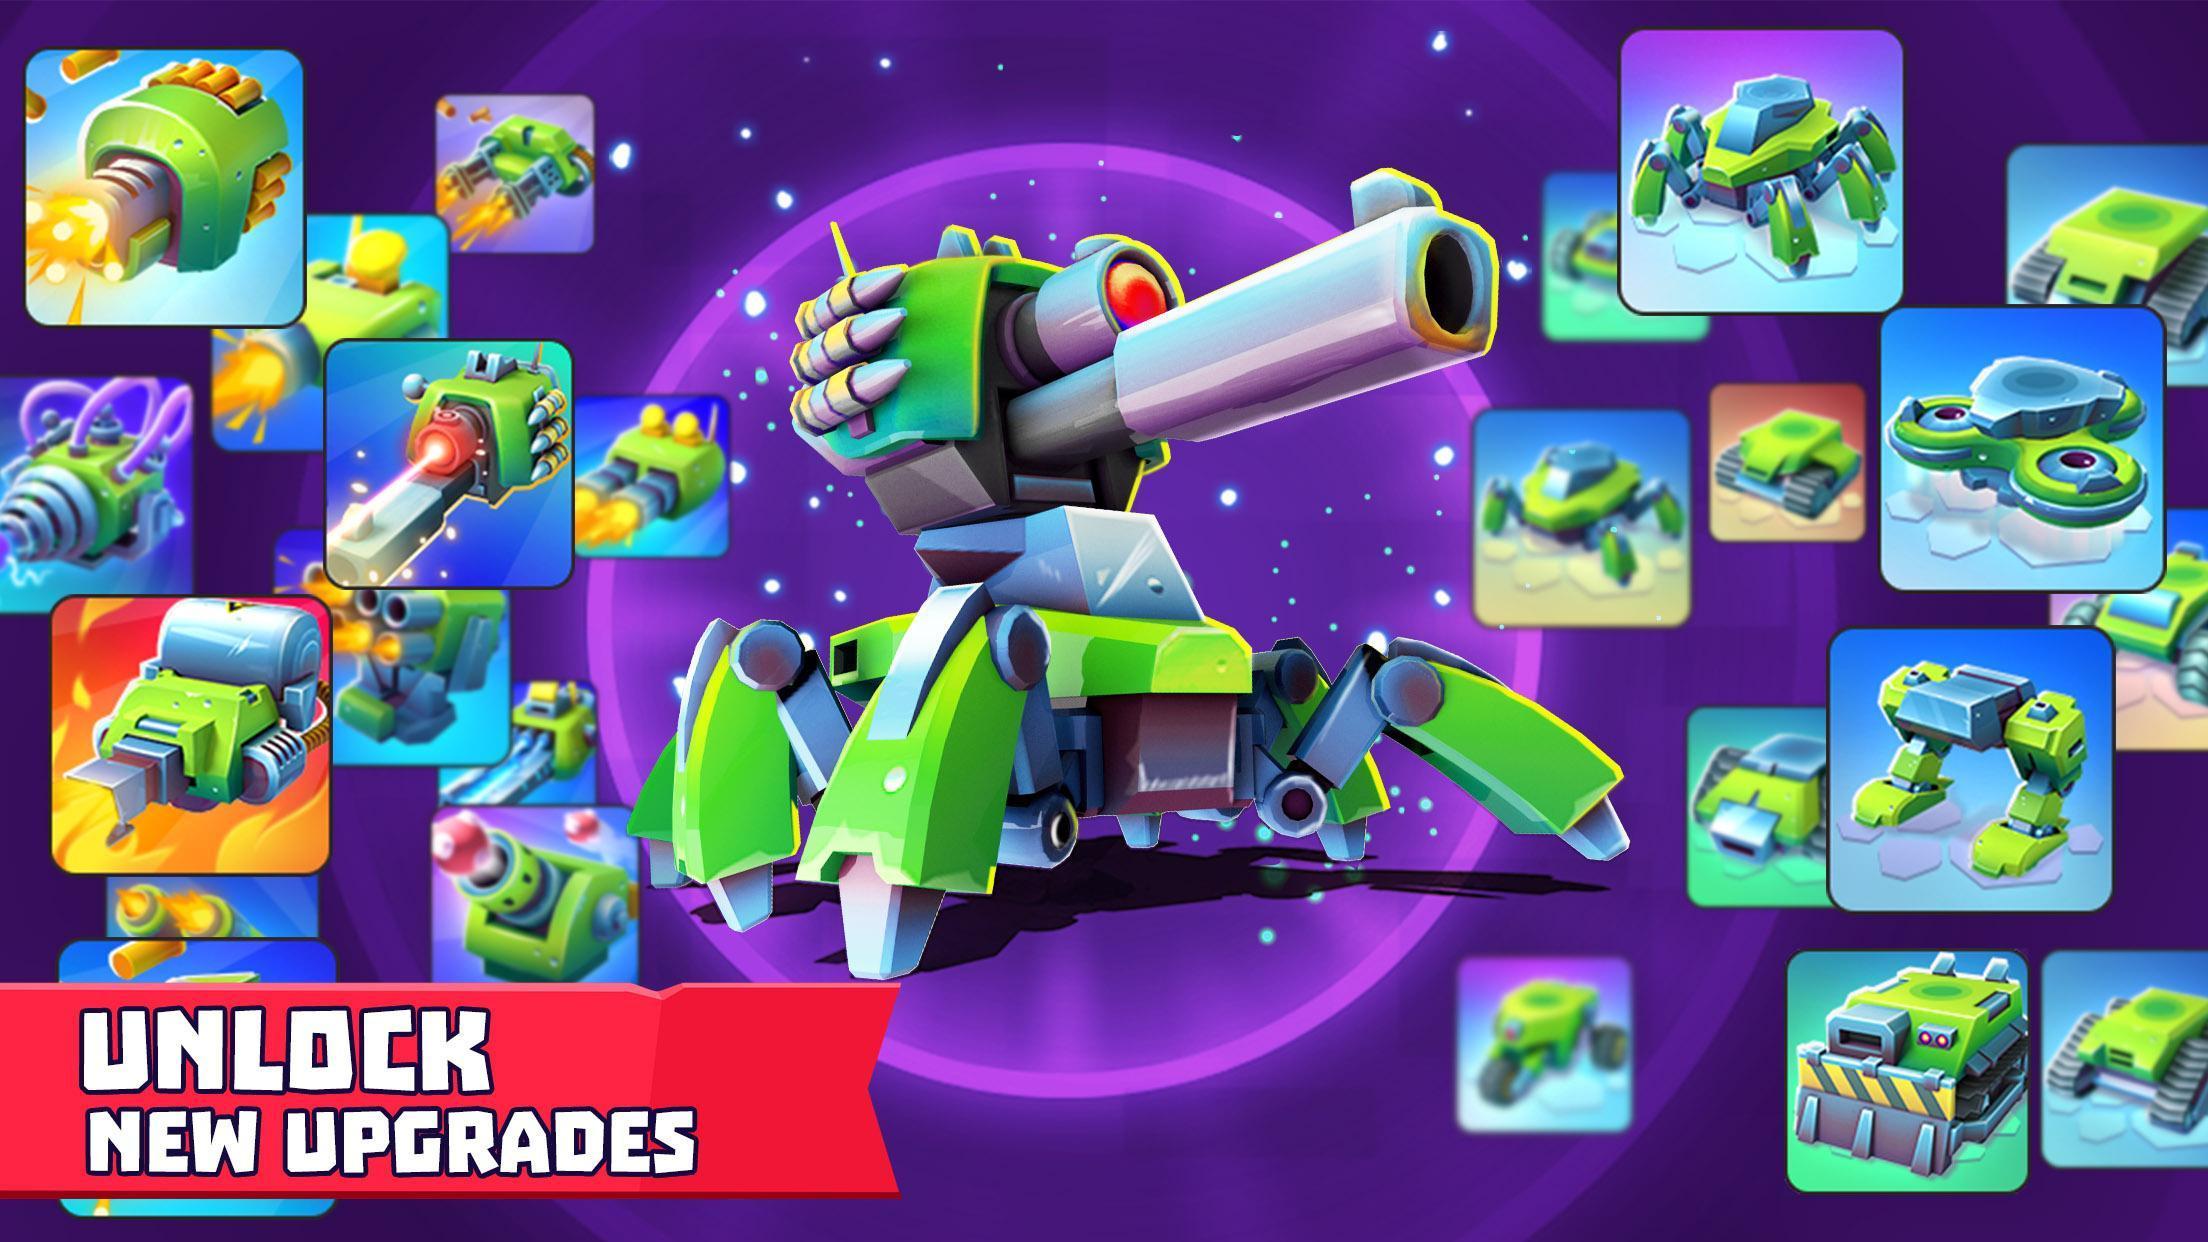 Tanks A Lot! - Realtime Multiplayer Battle Arena 2.56 Screenshot 4